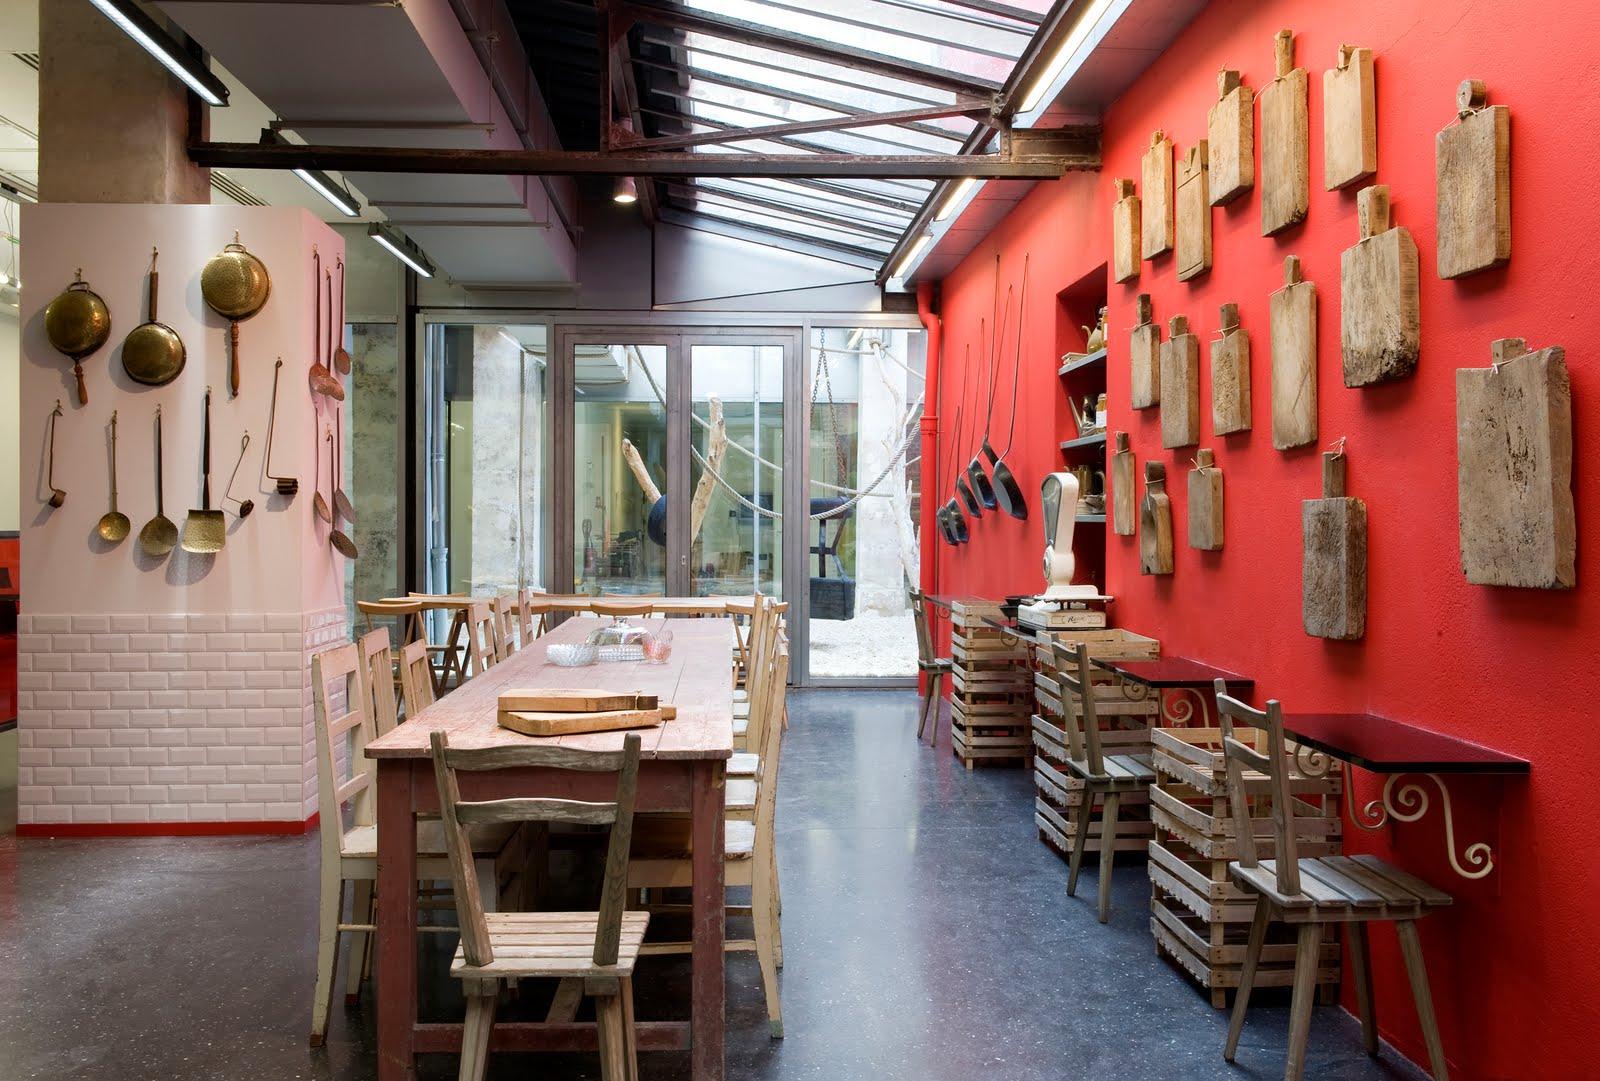 LaFleur de Paris: Buon ARTatitto!: Rose Bakery Culture gets an Italian Makeover